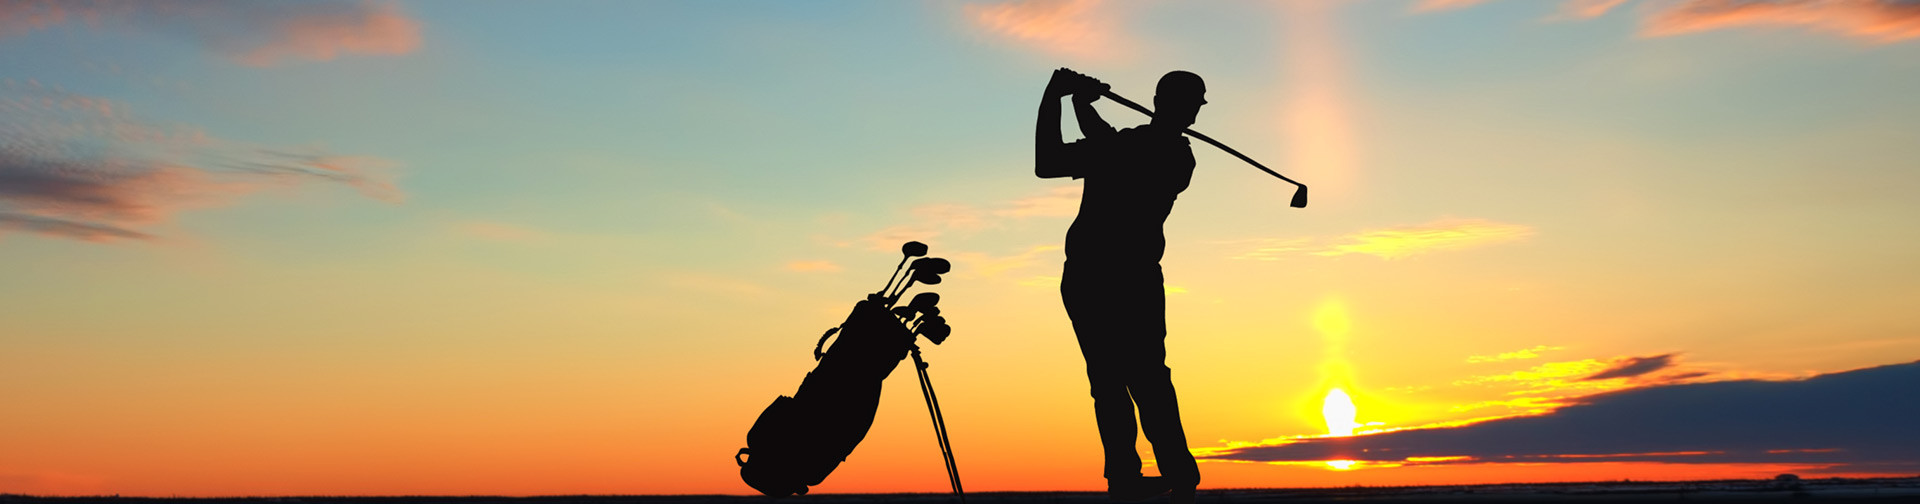 golf1920x504